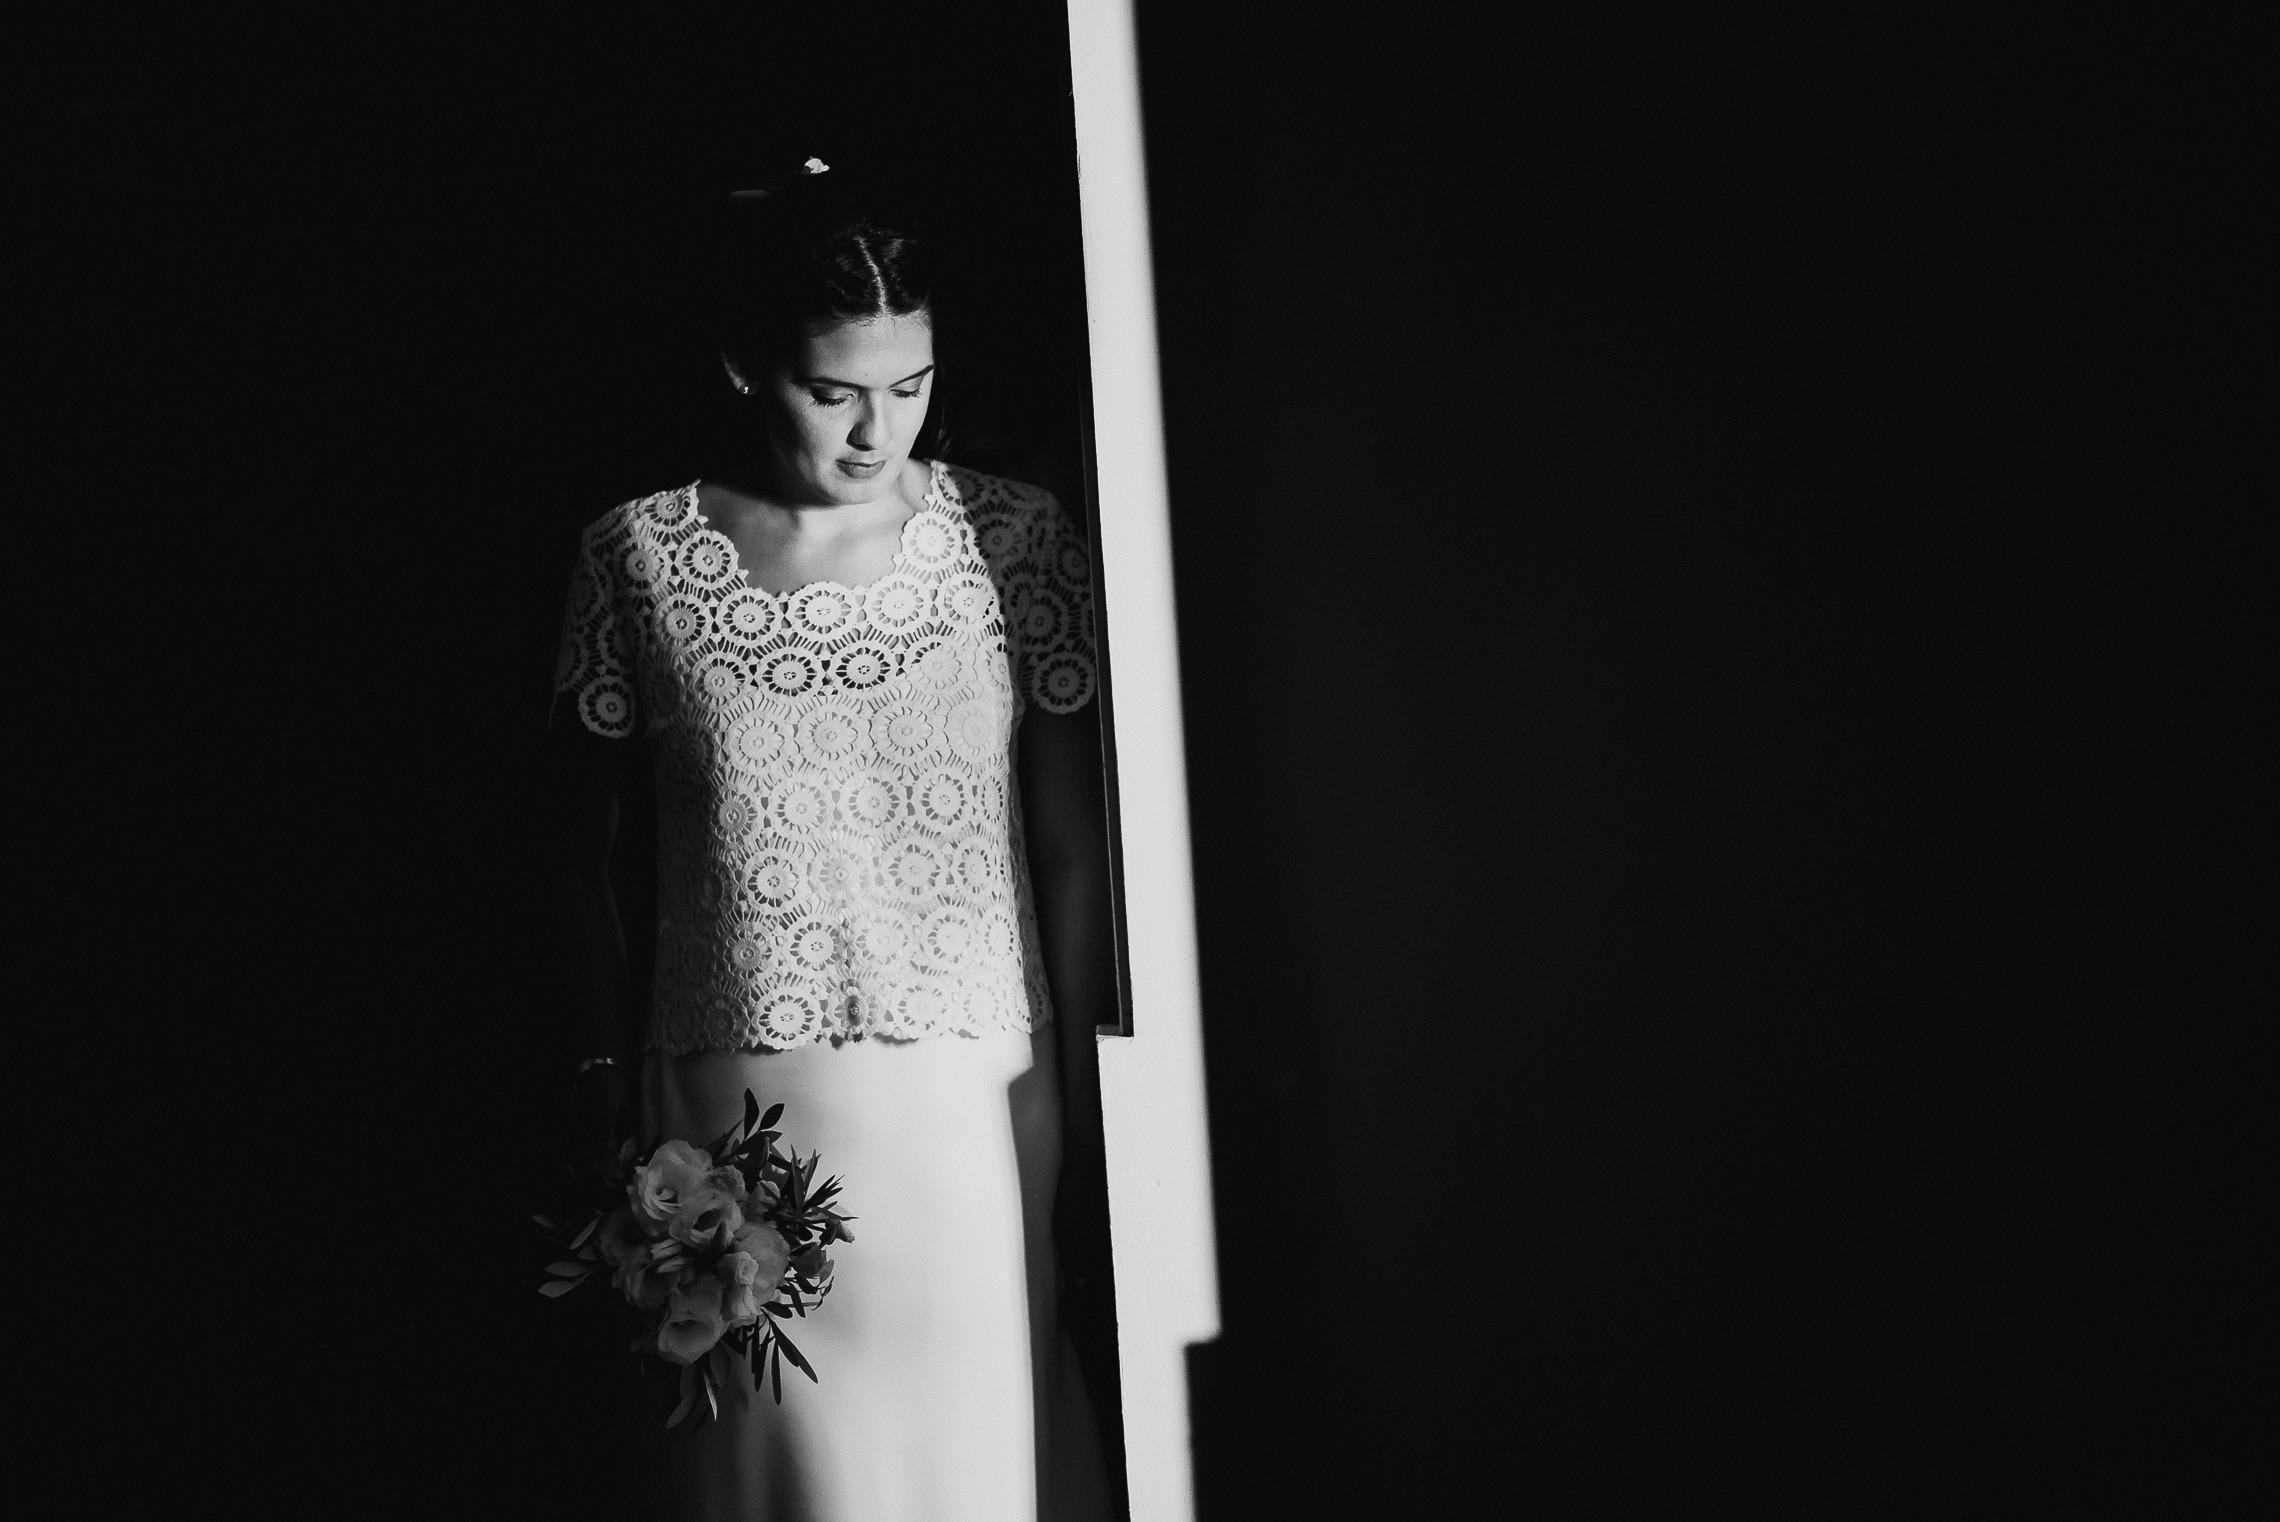 fotografo-de-casamientos-argentina-chile-uruguay-deborah-dantzoff-destination-wedding-photographer